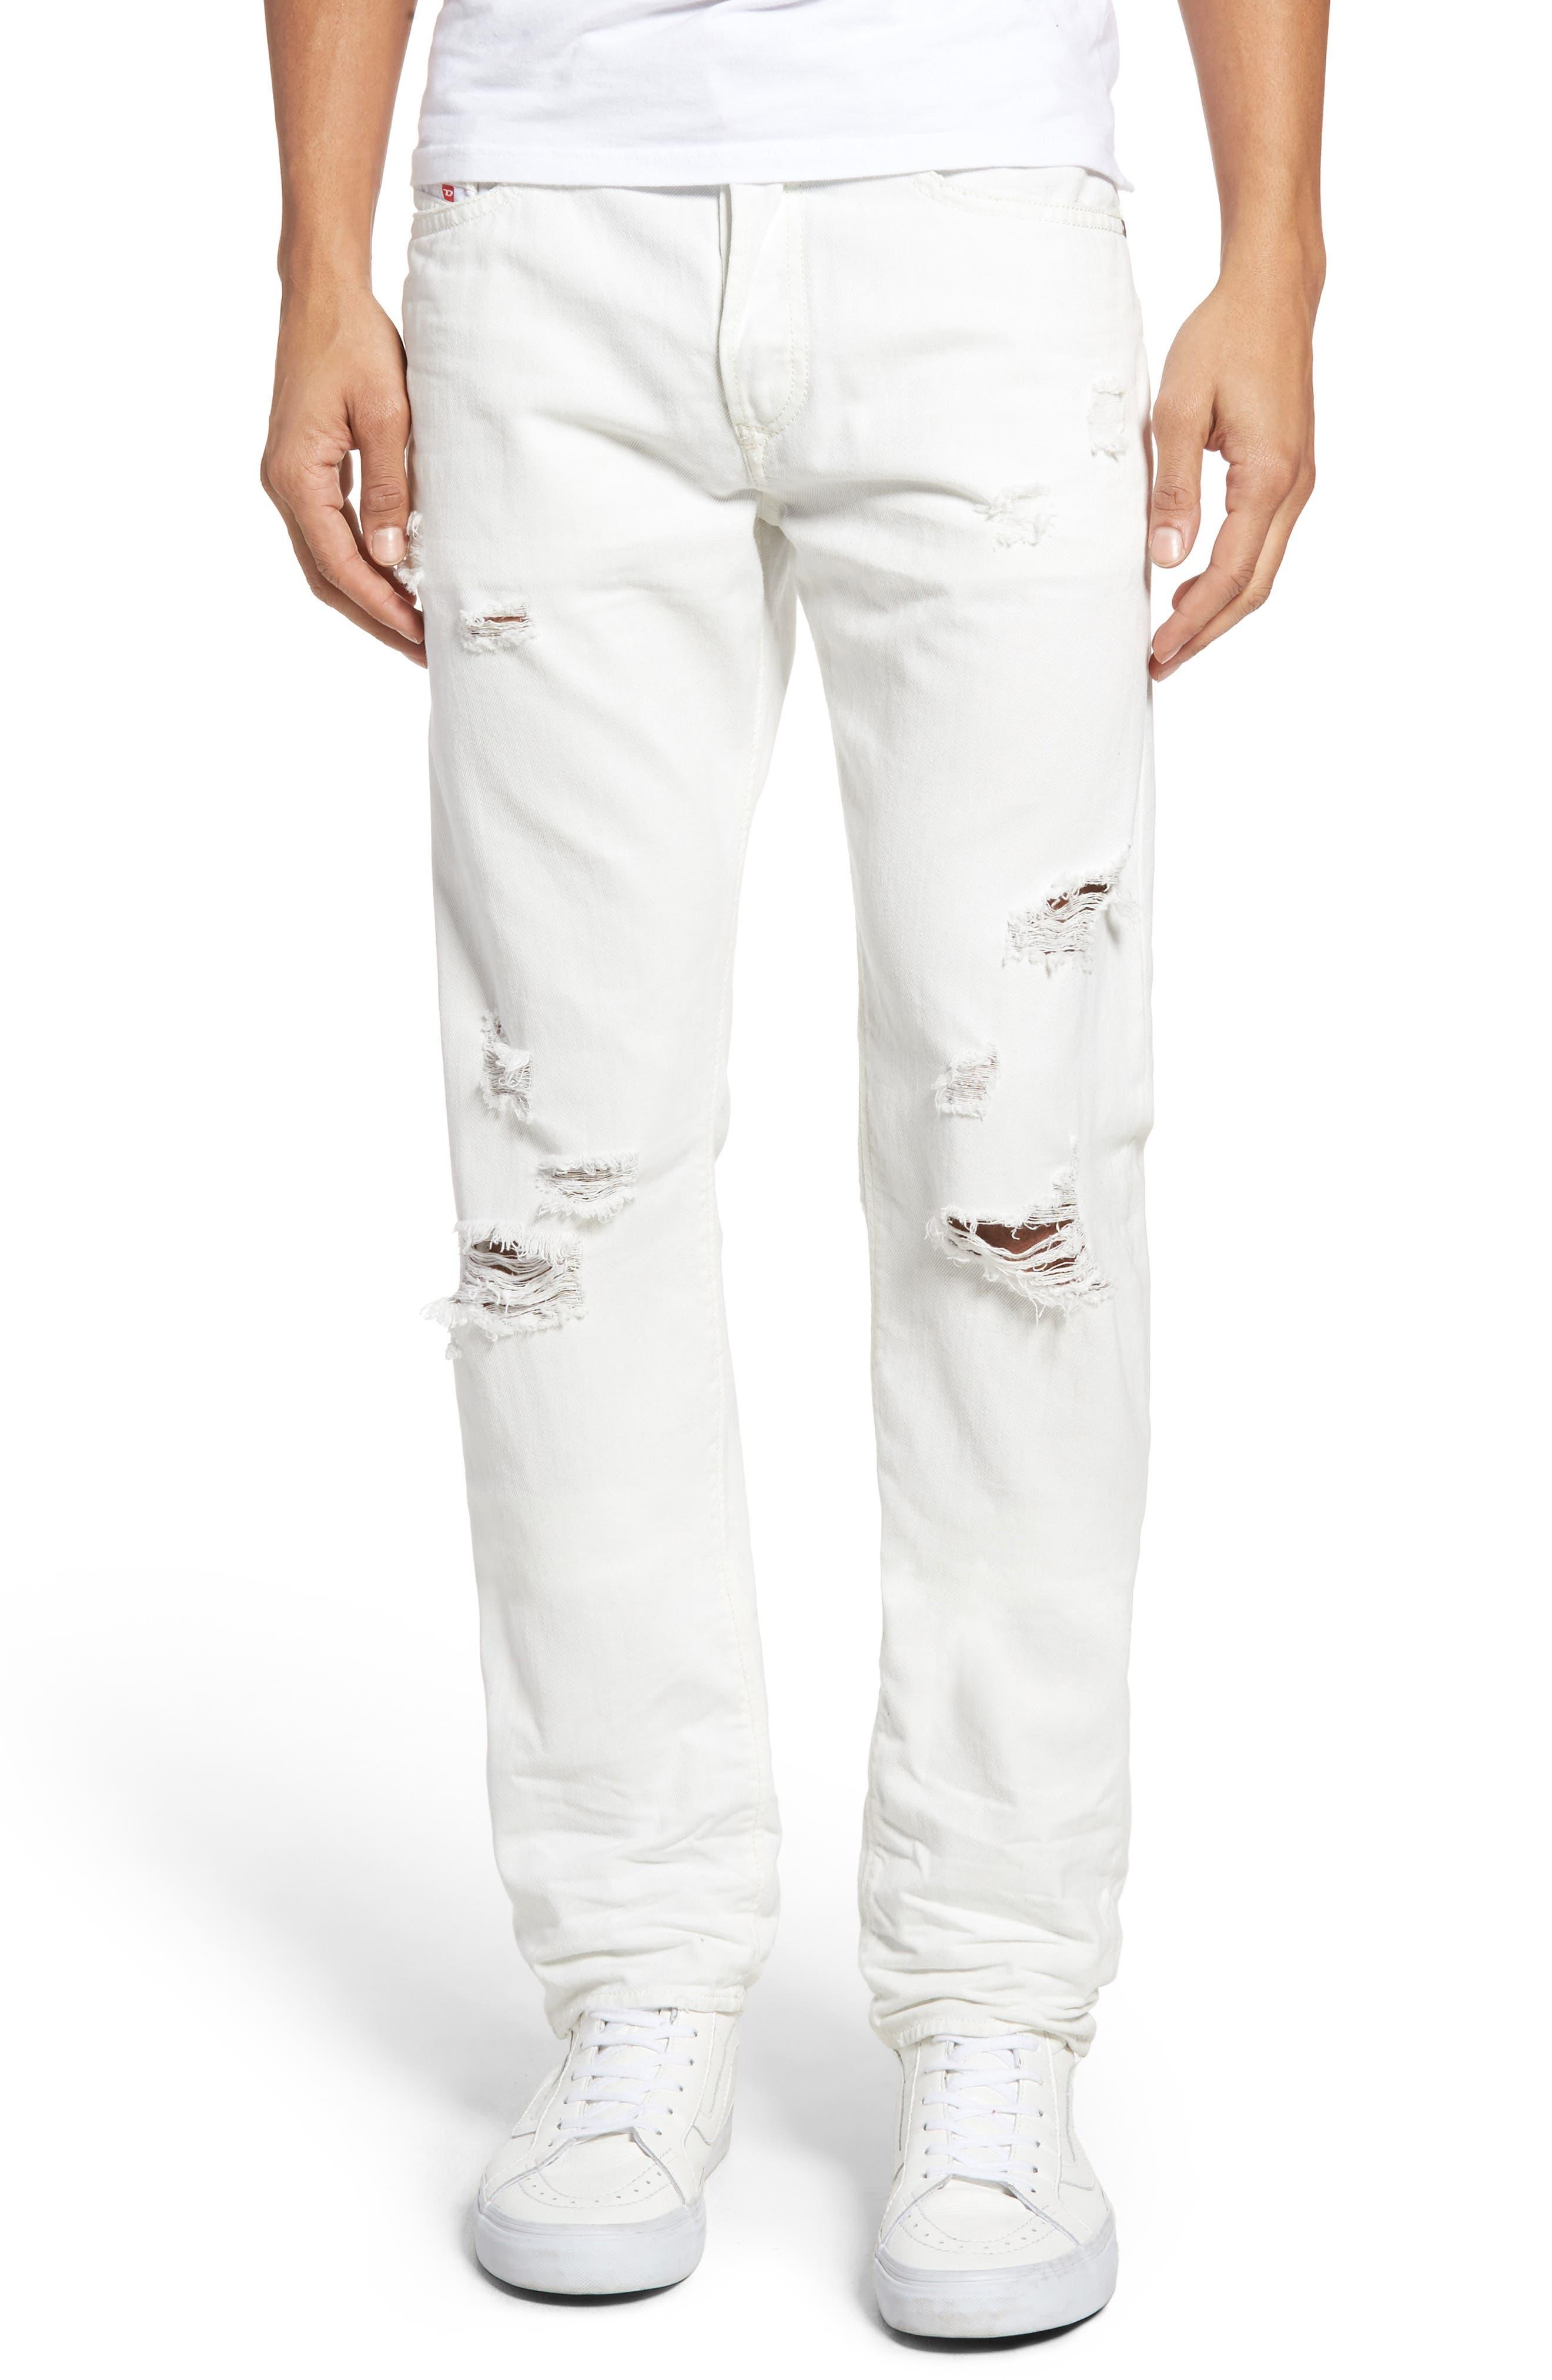 Buster Slim Straight Leg Jeans,                         Main,                         color, 680K